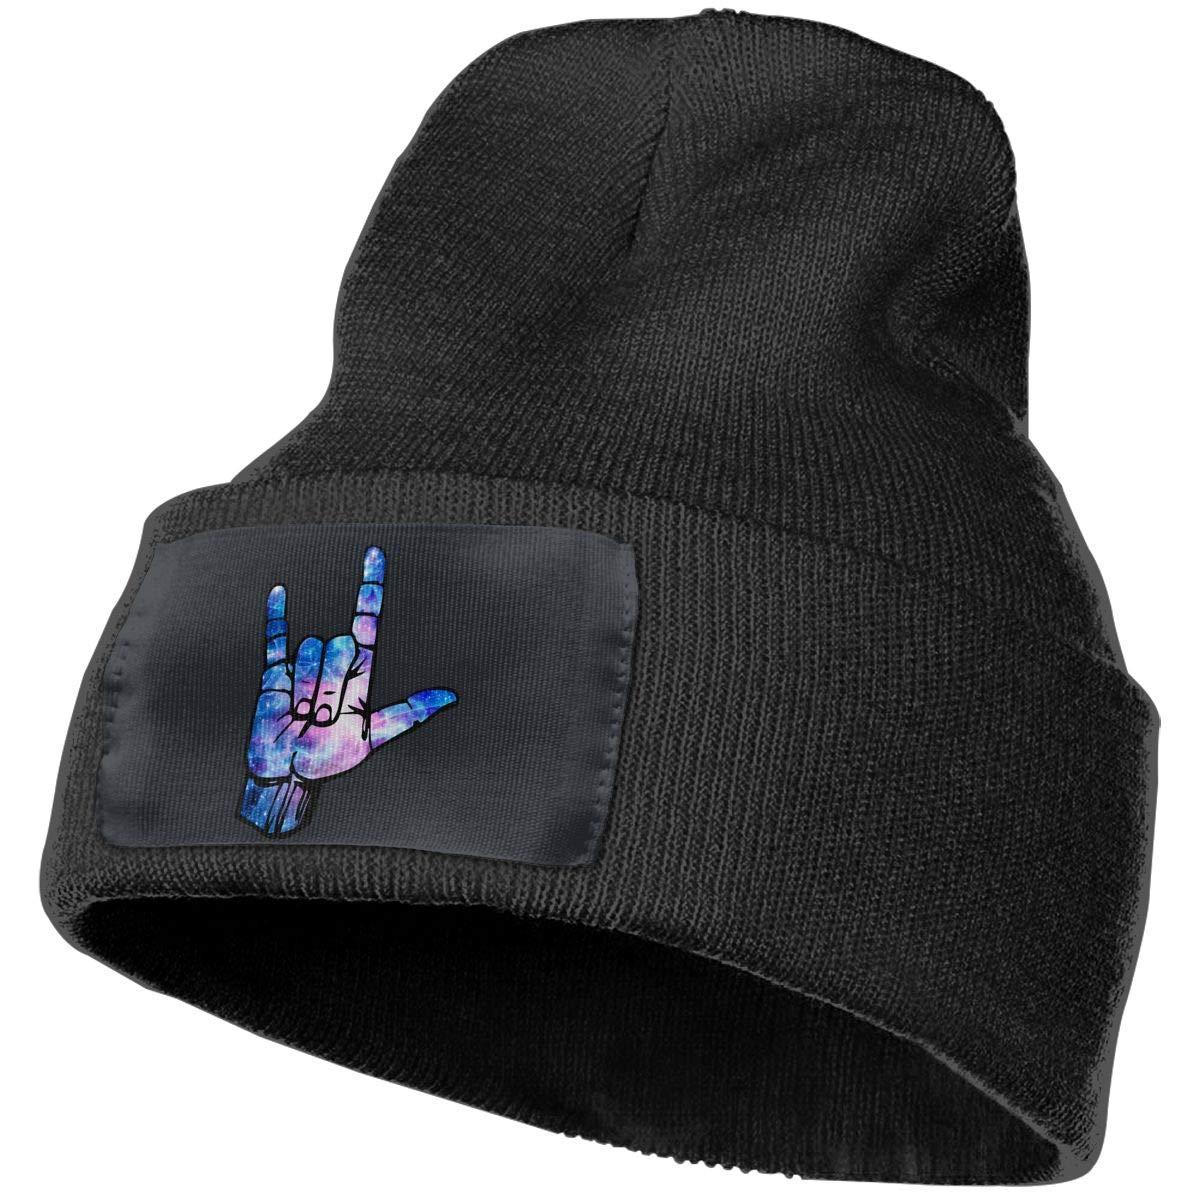 Sheery American Sign Language I Love You Casual Knit Cap for Men Women 100/% Acrylic Acid Skull Cap Woolen Hat